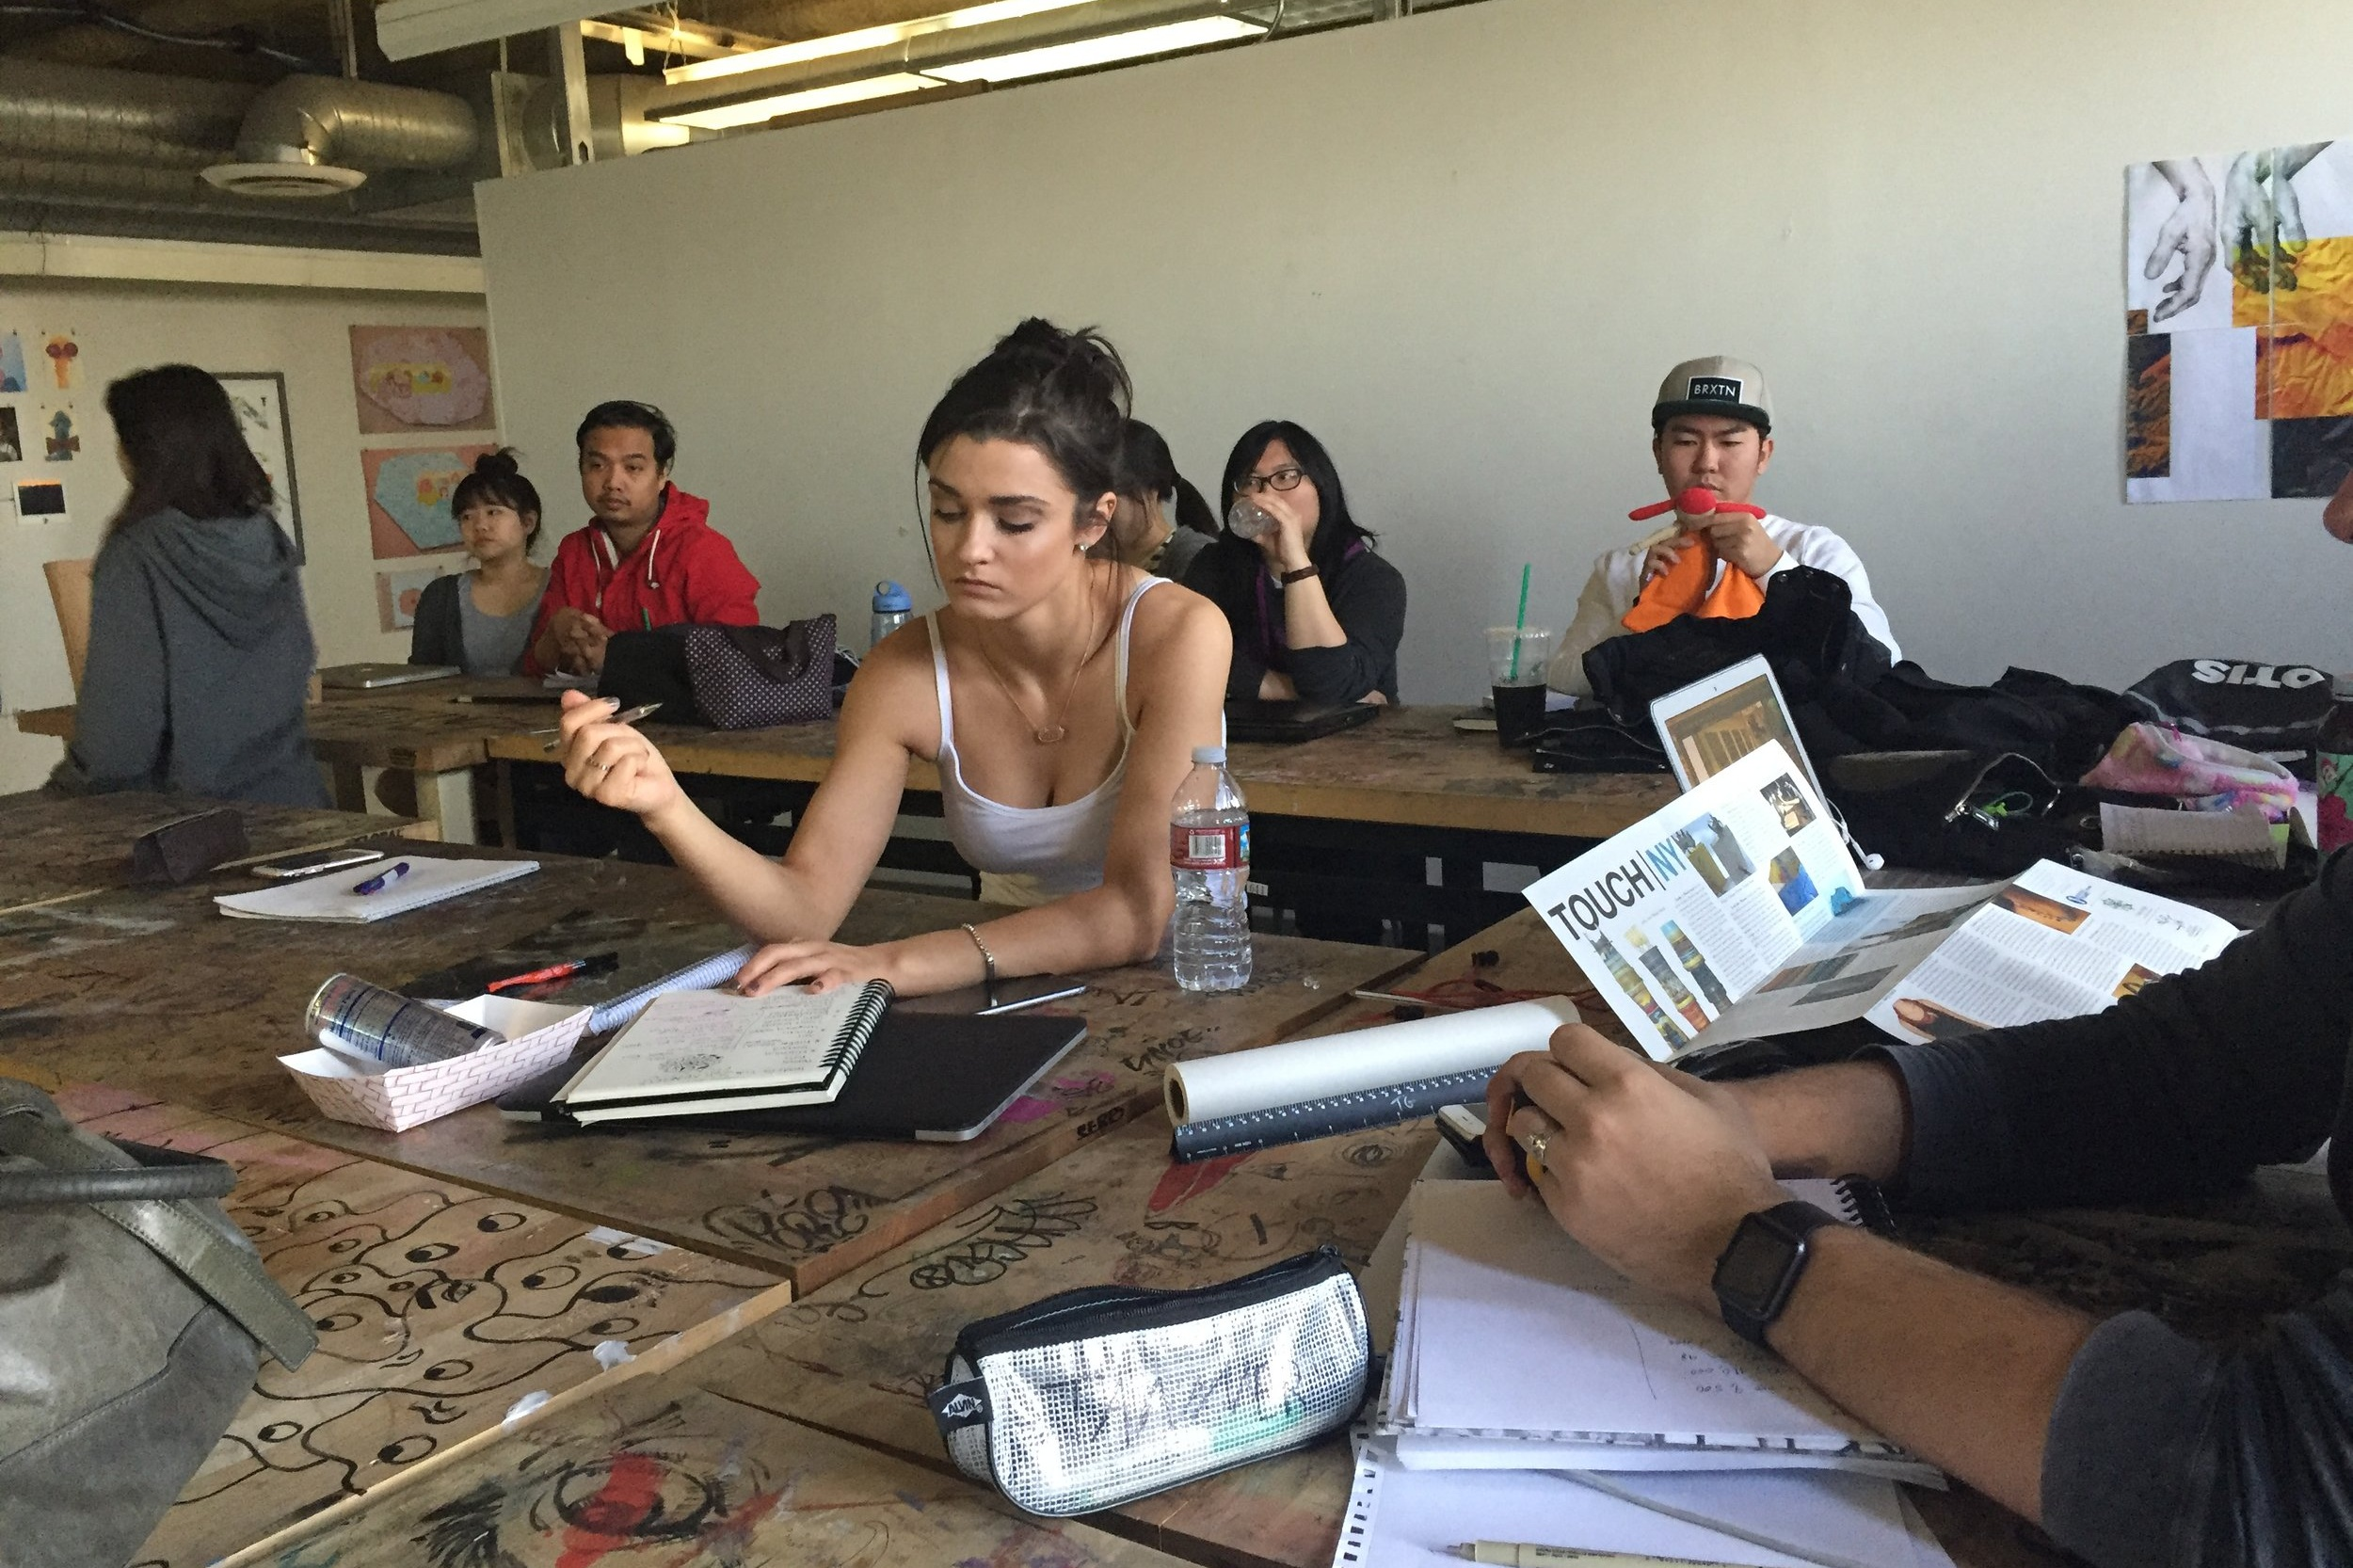 Otis College of Art and Design - Los Angeles, United States • 2016